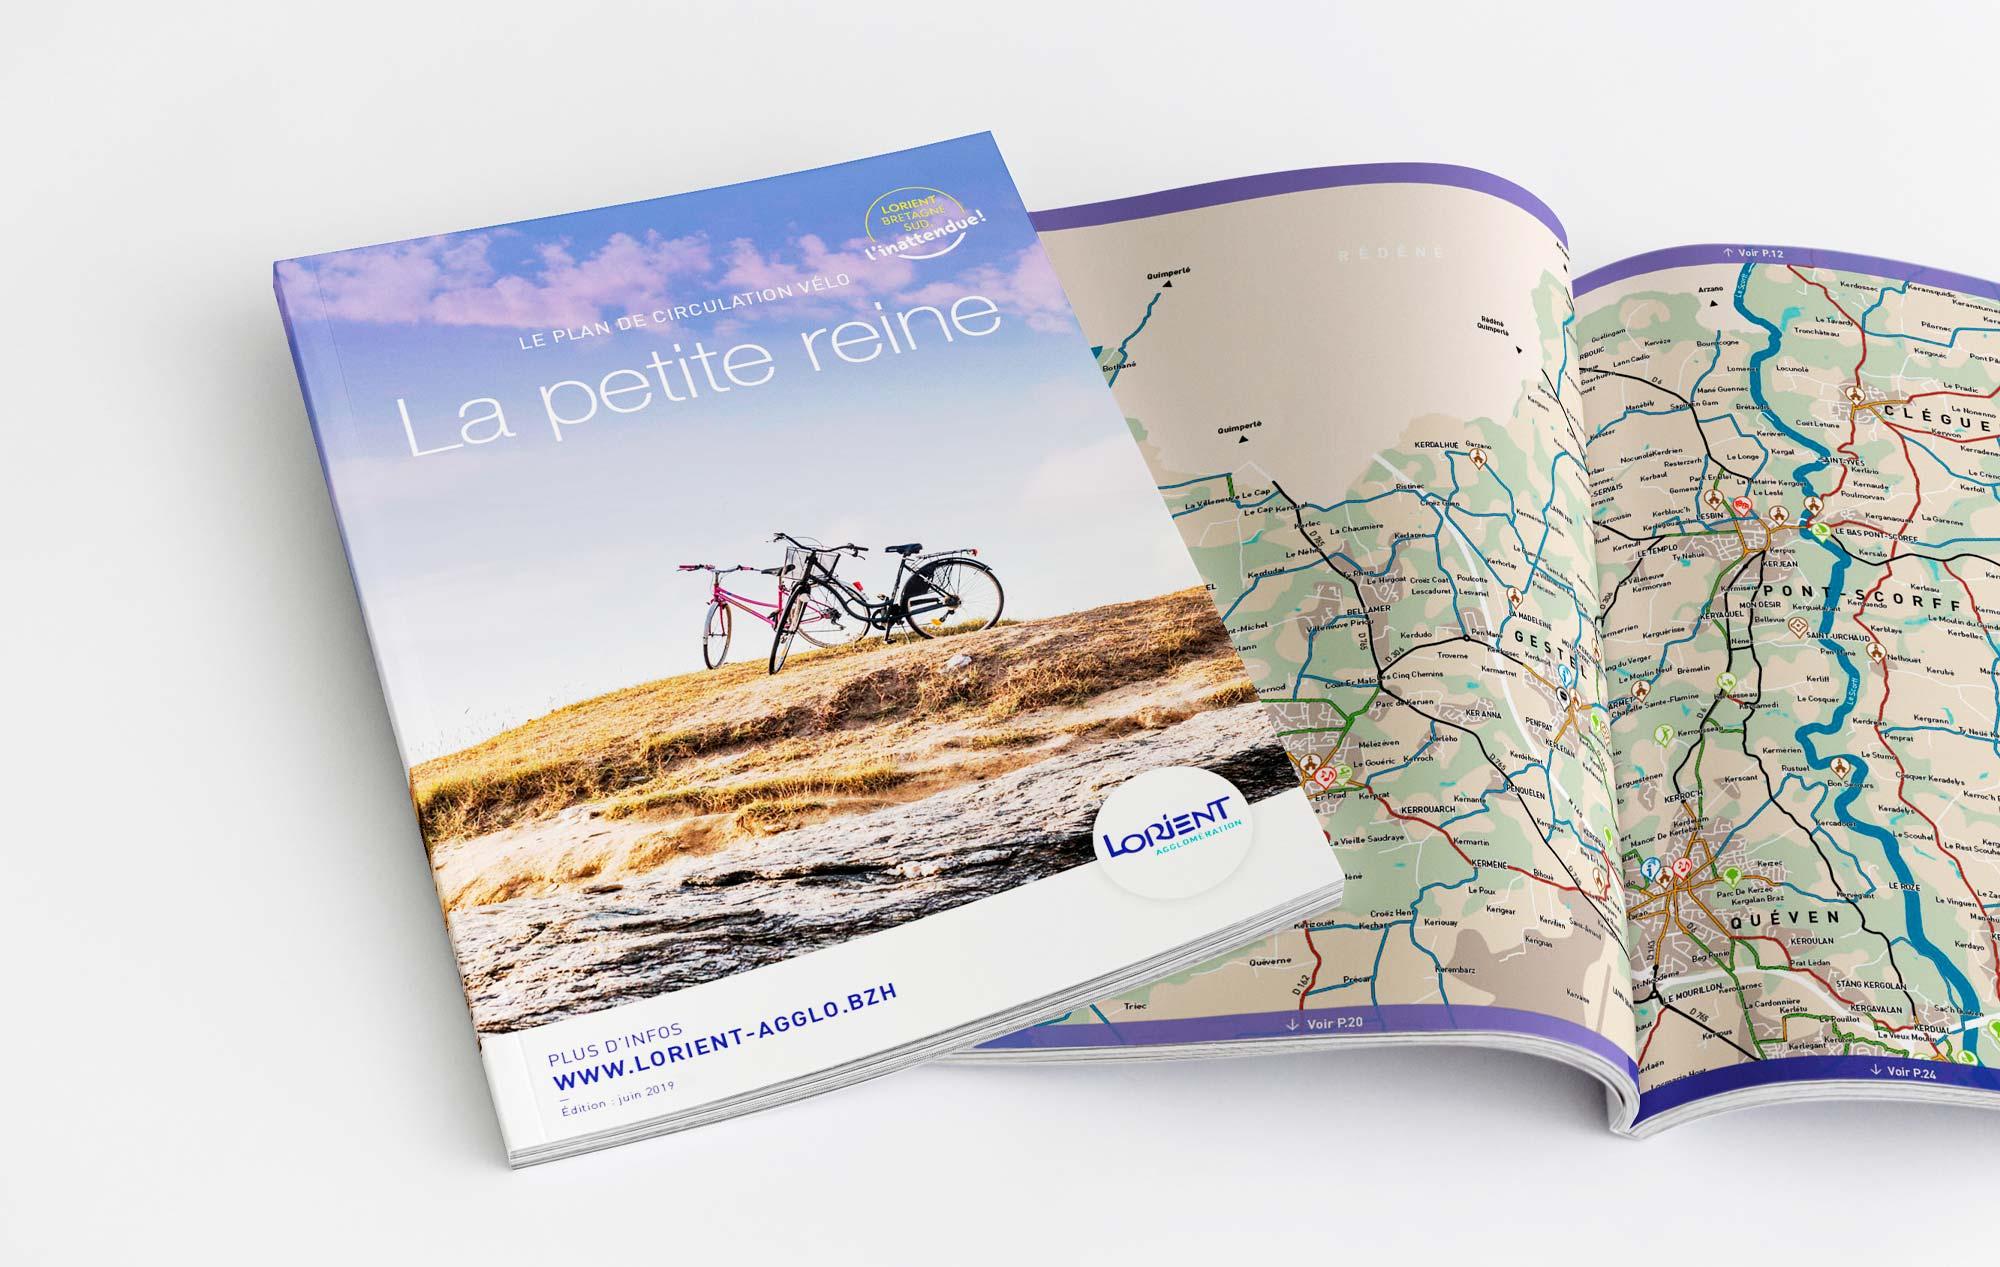 Guide la petite reine carto-vélo Lorient Agglo